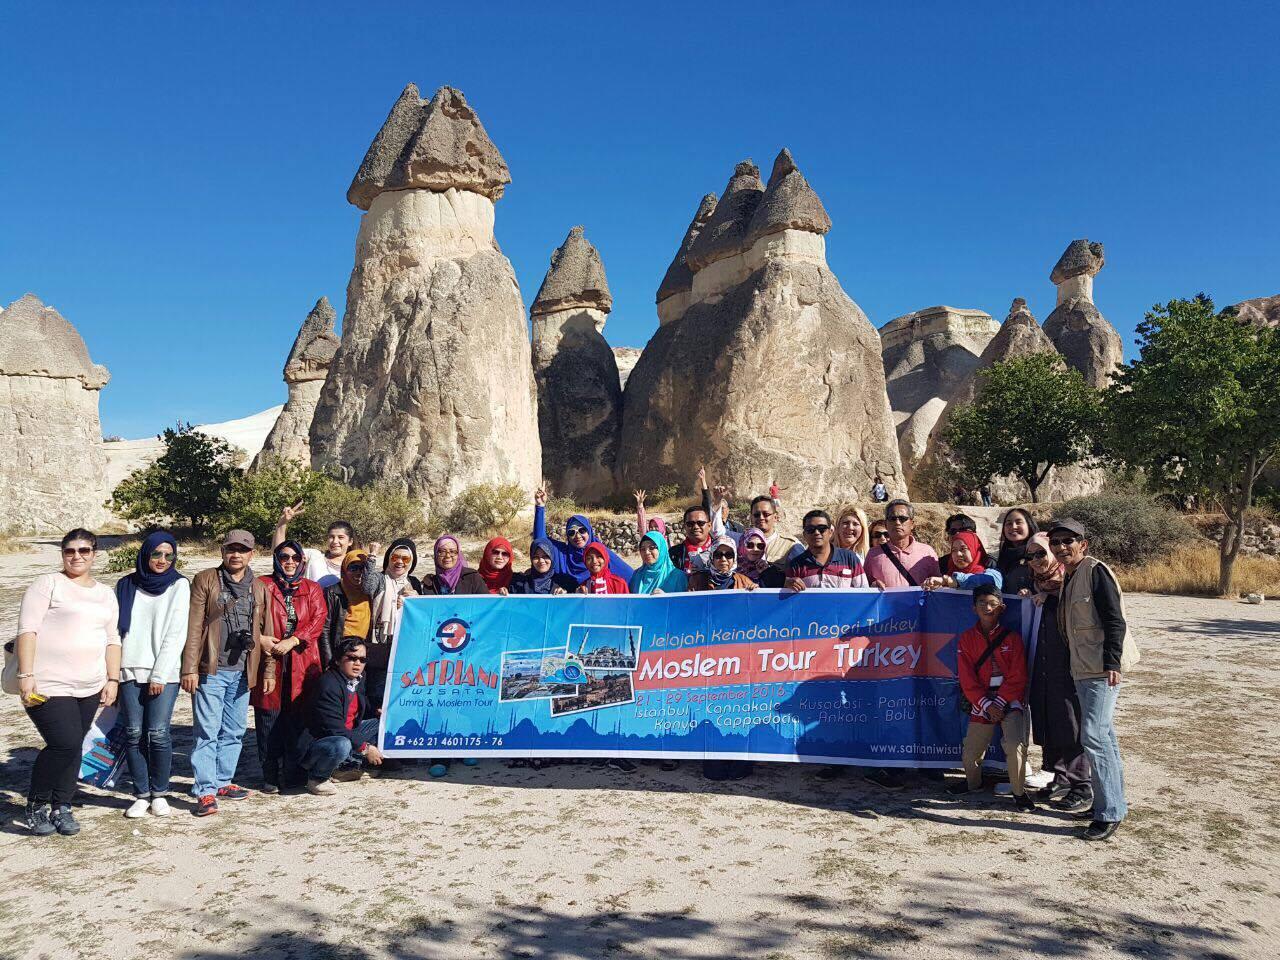 Paket Umroh Dan Muslim Tour Murah Jakarta Satriani Wisata